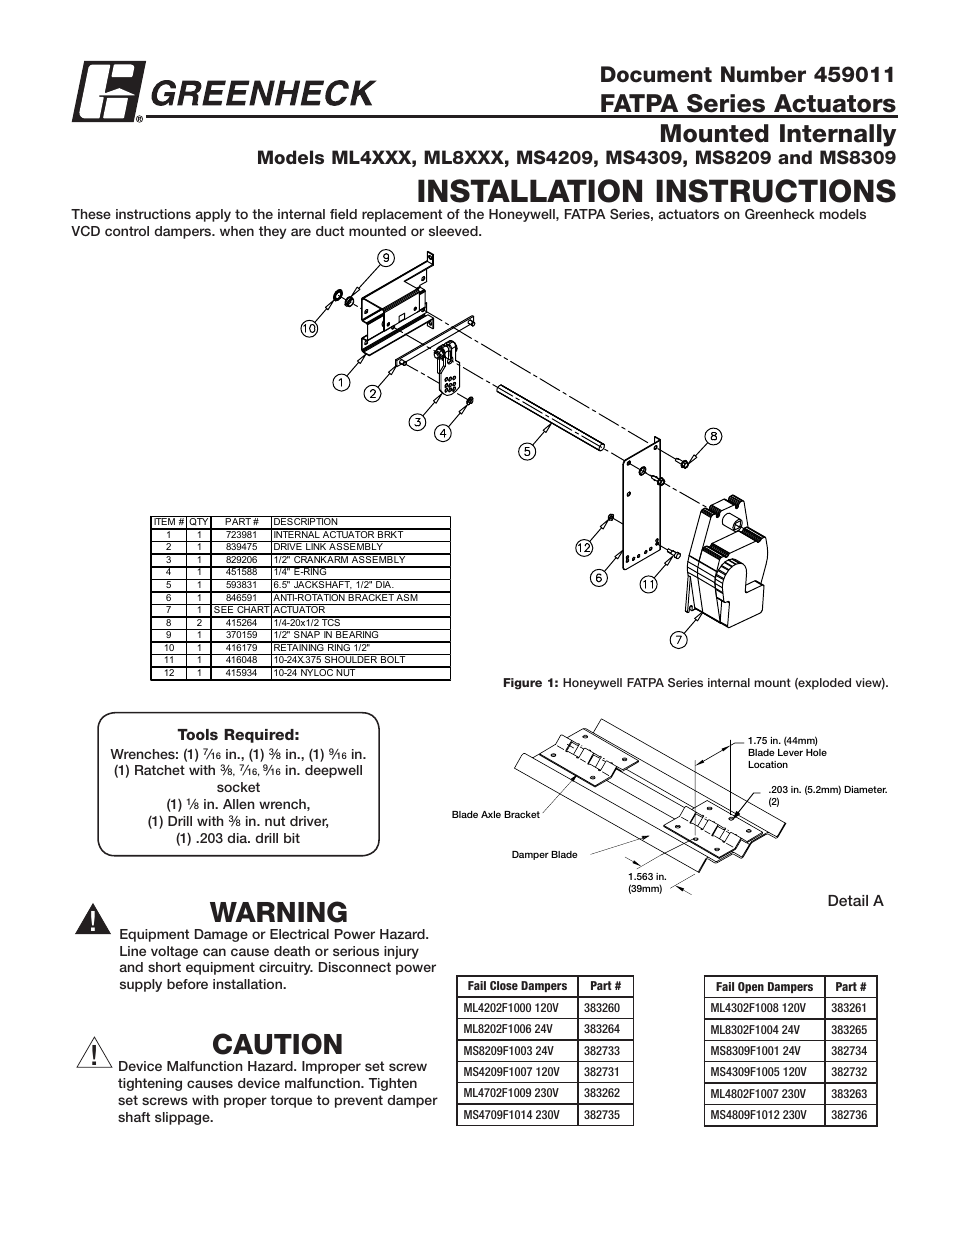 Honeywell Ml4302f1008 Actuator Wiring Diagram Trusted. Greenheck Ml4xxx Ml8xxx Series 459011 User Manual 2 Pages Wiring Module Honeywell Diagram S86100 Ml4302f1008 Actuator. Wiring. Honeywell Ms7520 Actuator Wiring Diagram At Scoala.co